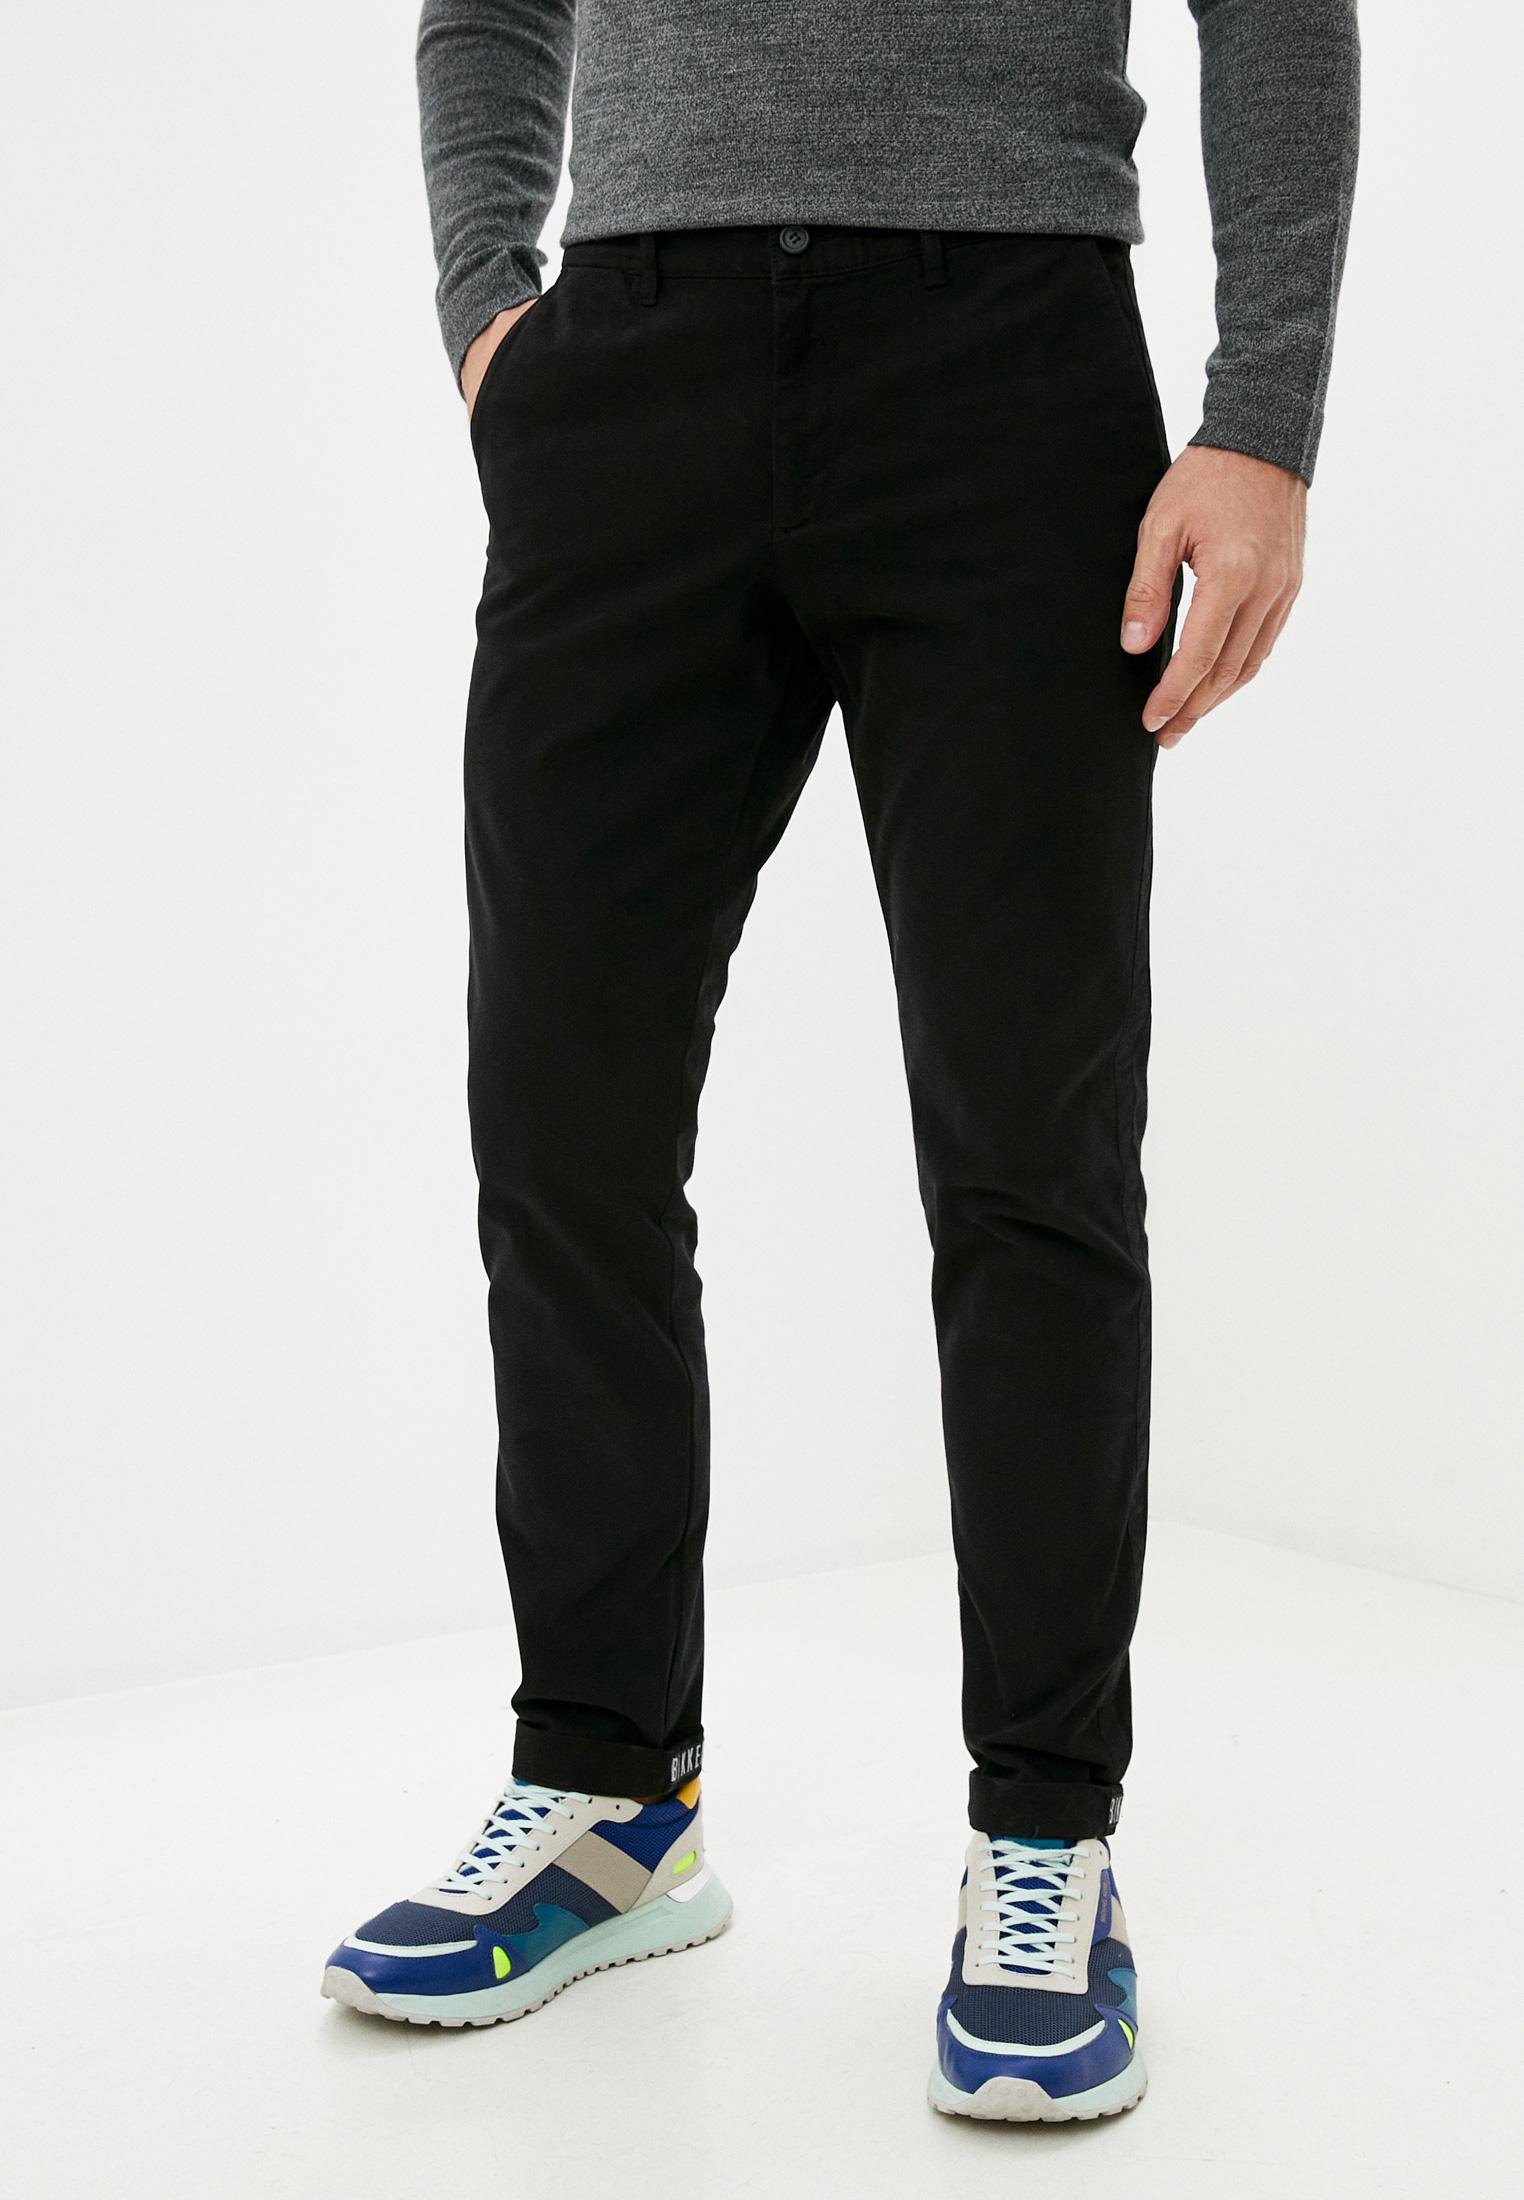 Мужские повседневные брюки Bikkembergs (Биккембергс) C P 001 04 S 3472